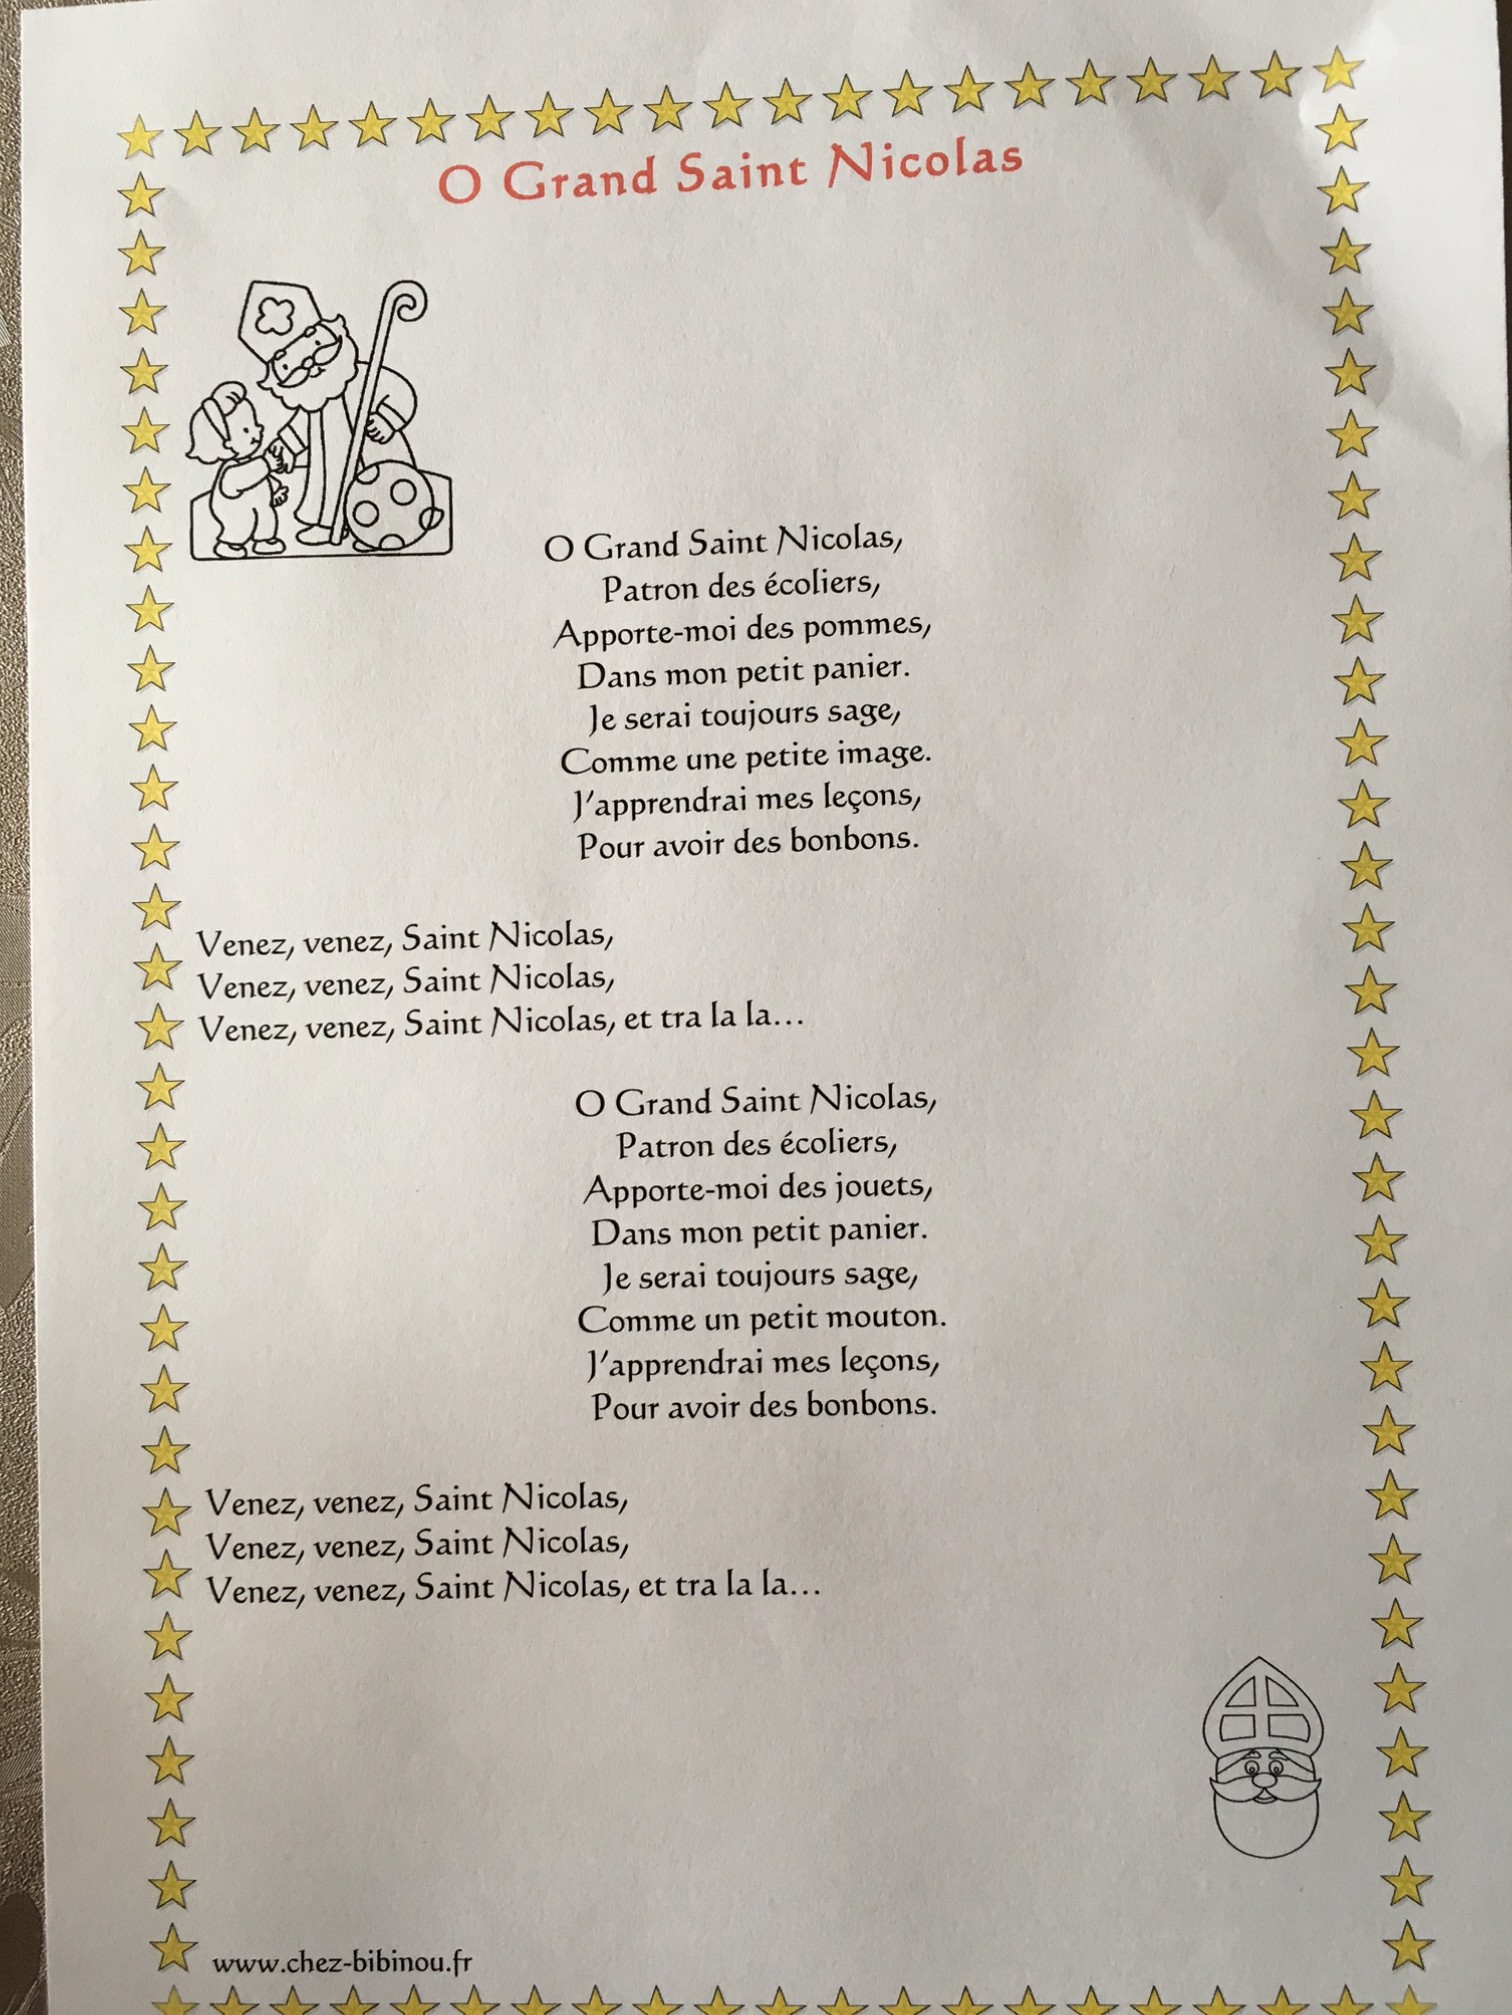 Ô Grand Saint Nicolas